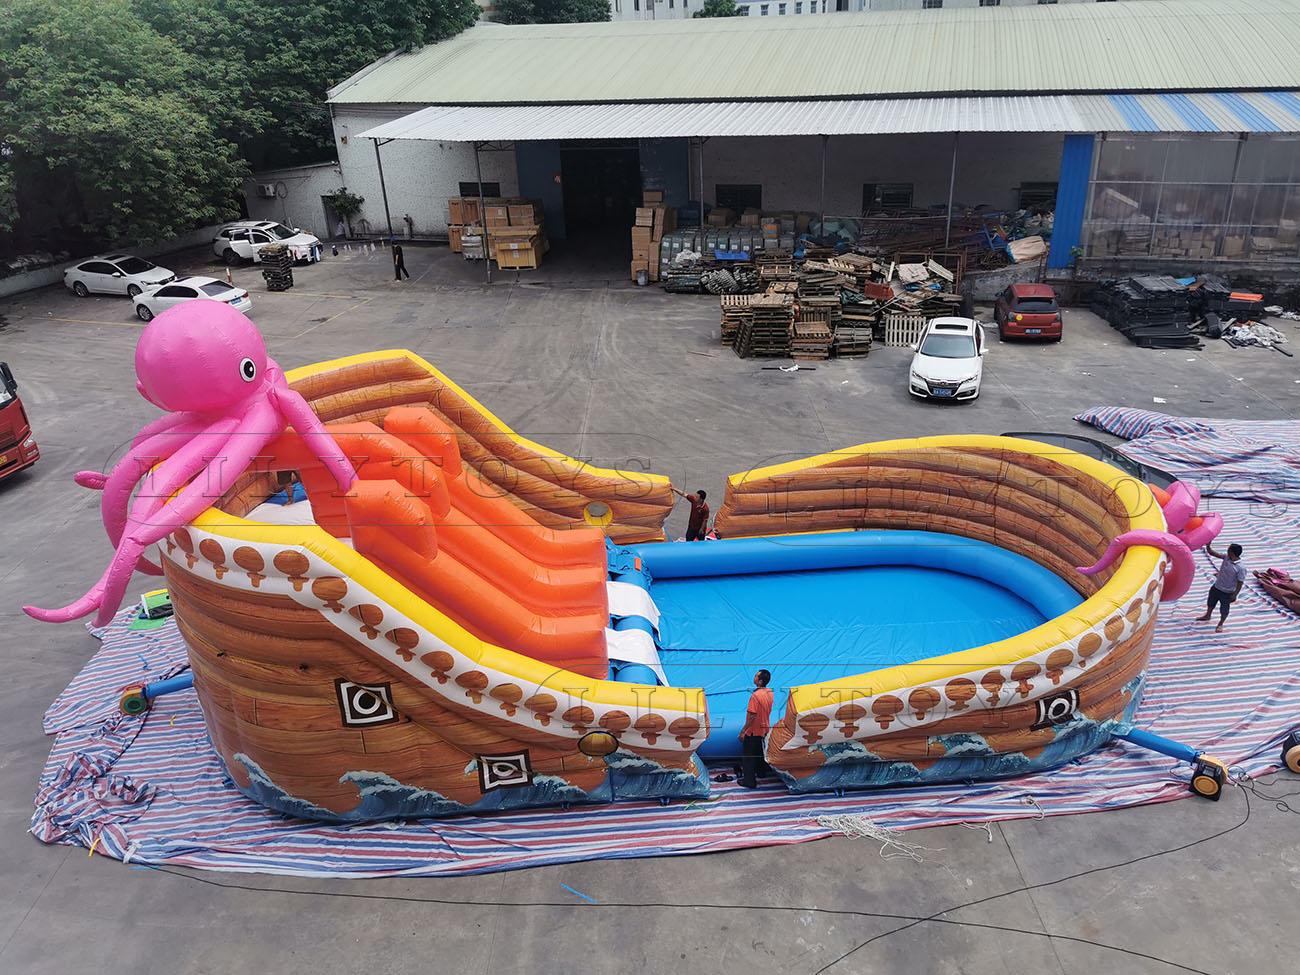 octopus pirte boat with pool